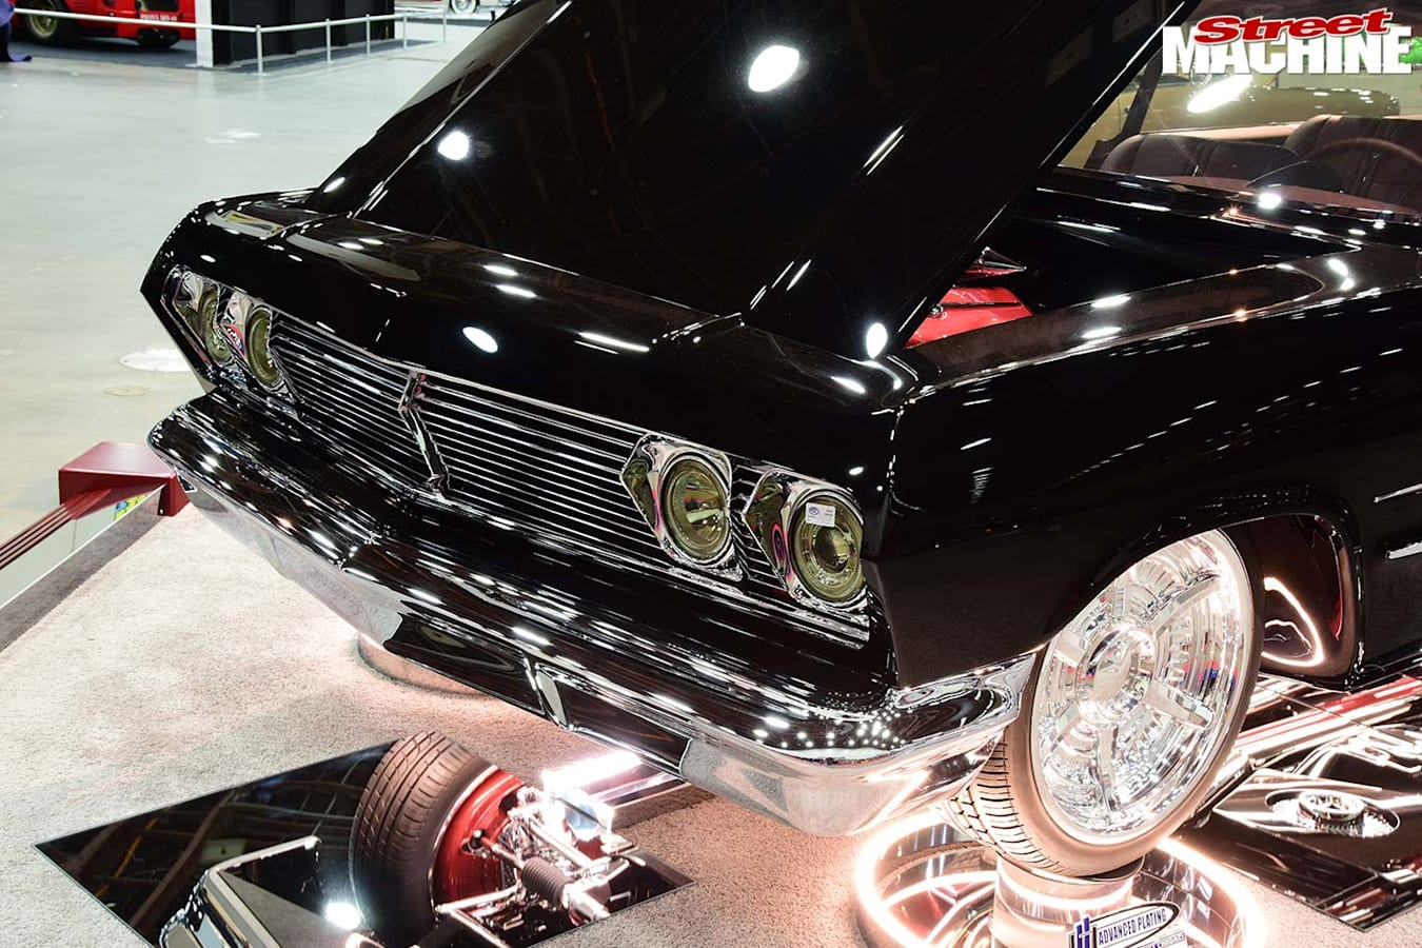 1963 Chev wagon